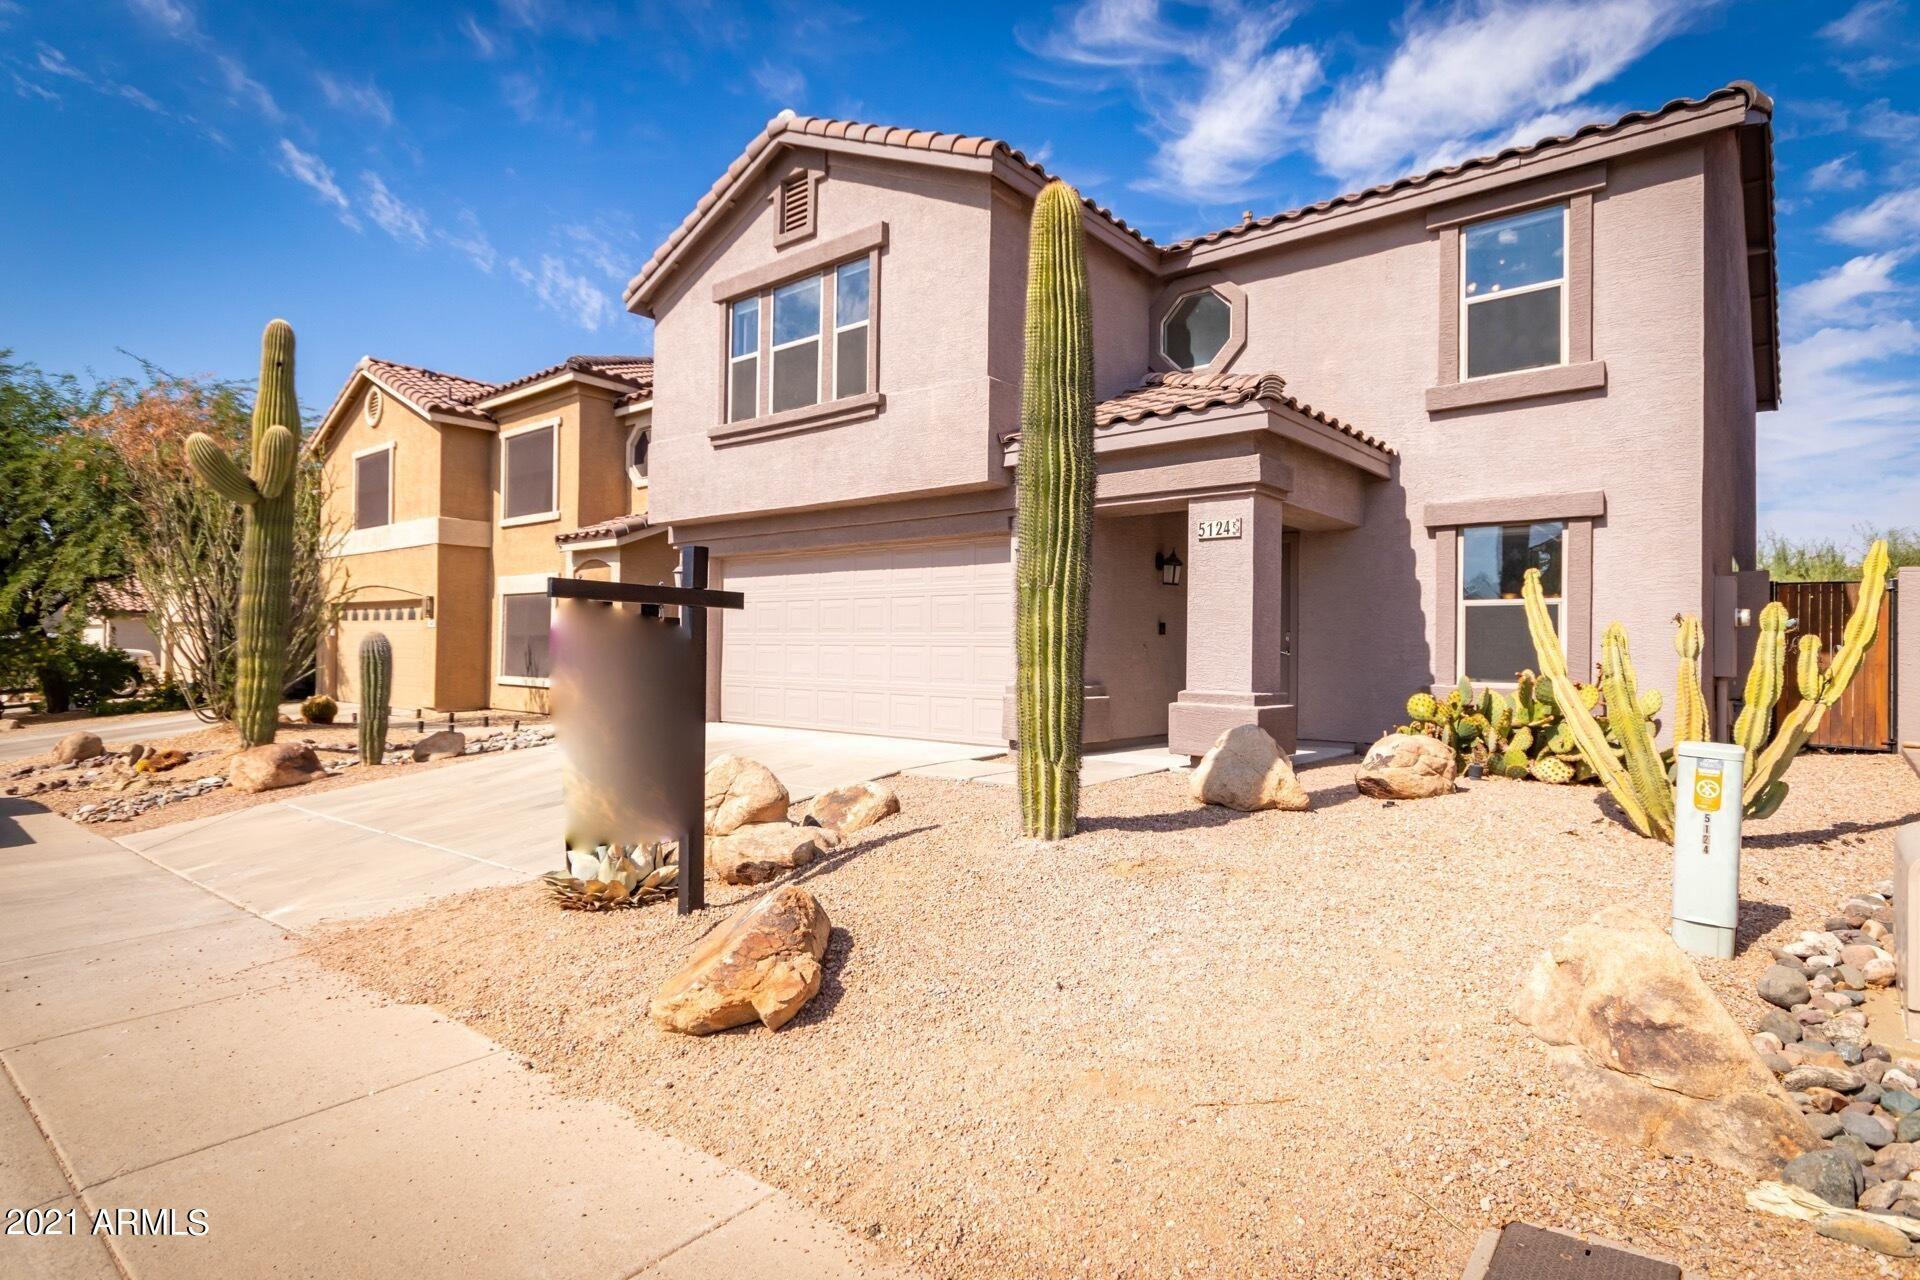 Photo of 5124 E PEAK VIEW Road, Cave Creek, AZ 85331 (MLS # 6304352)